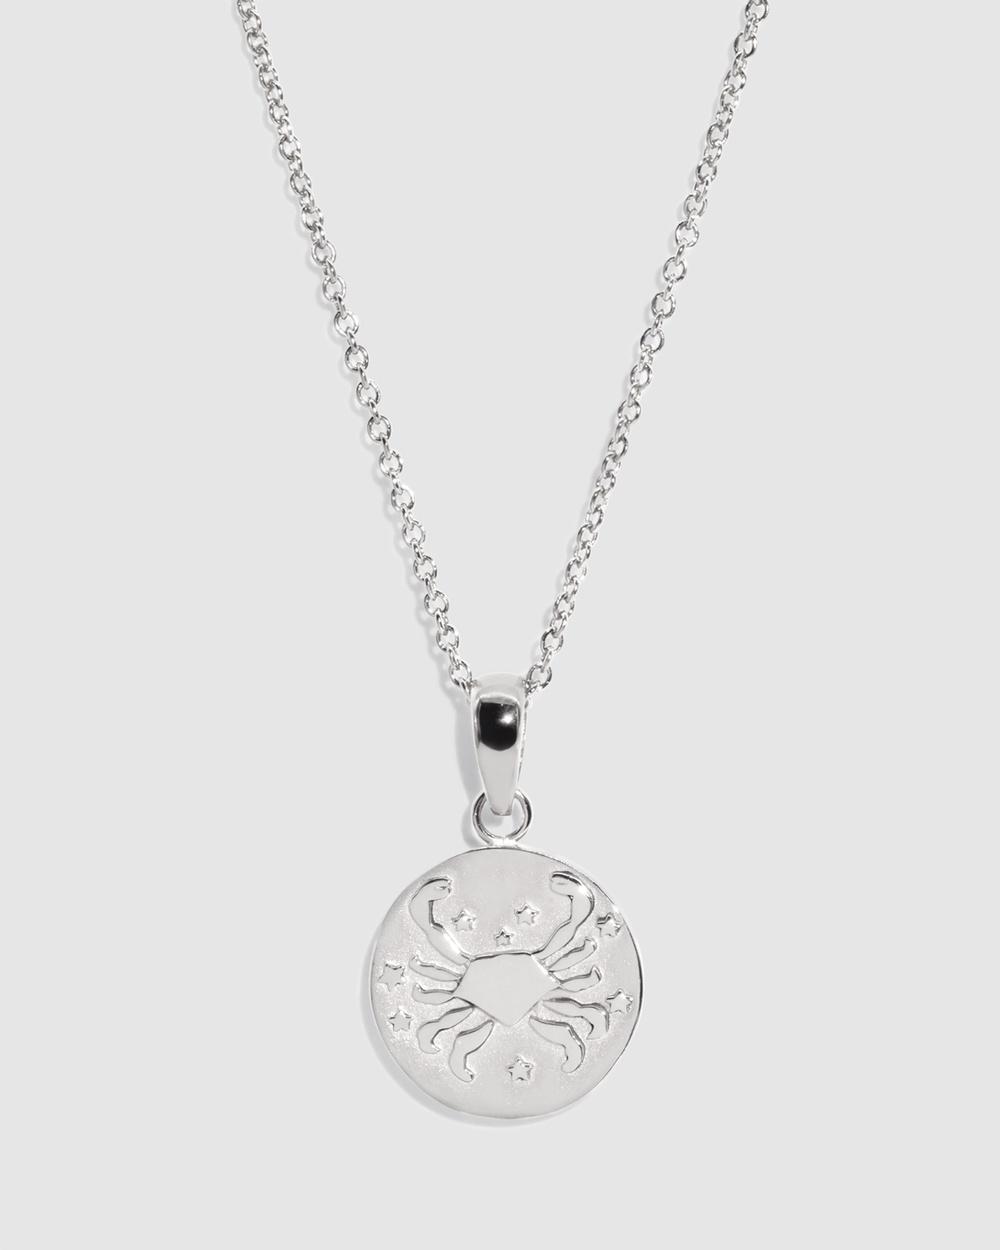 Molten Store The Silver Cancer Zodiac Pendant Necklace Jewellery Silver